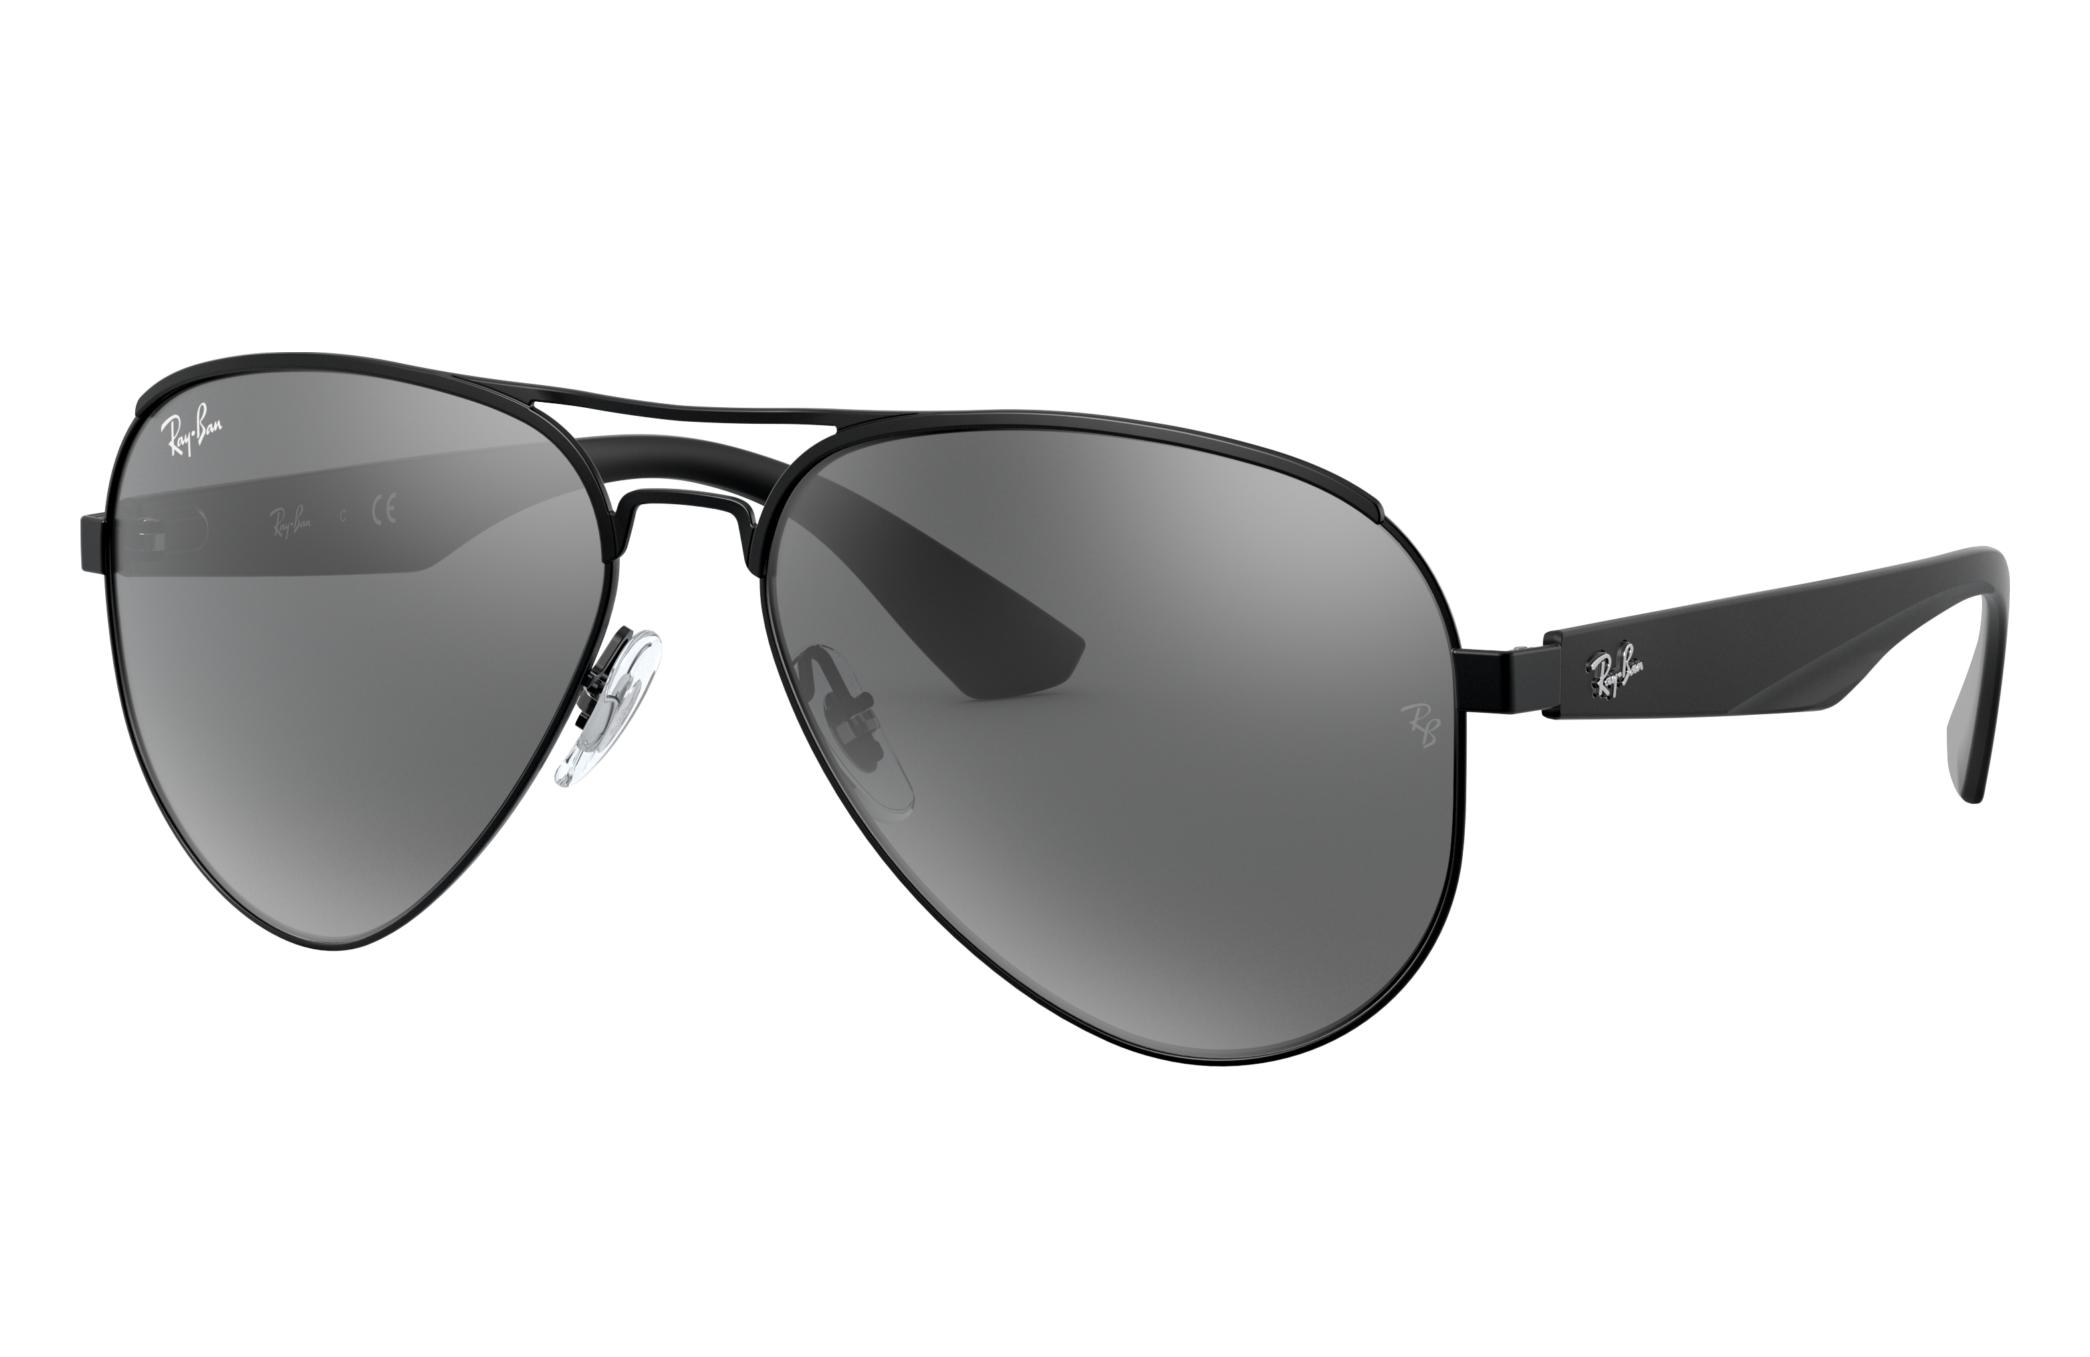 Ray-Ban Rb3523 Black, Gray Lenses - RB3523